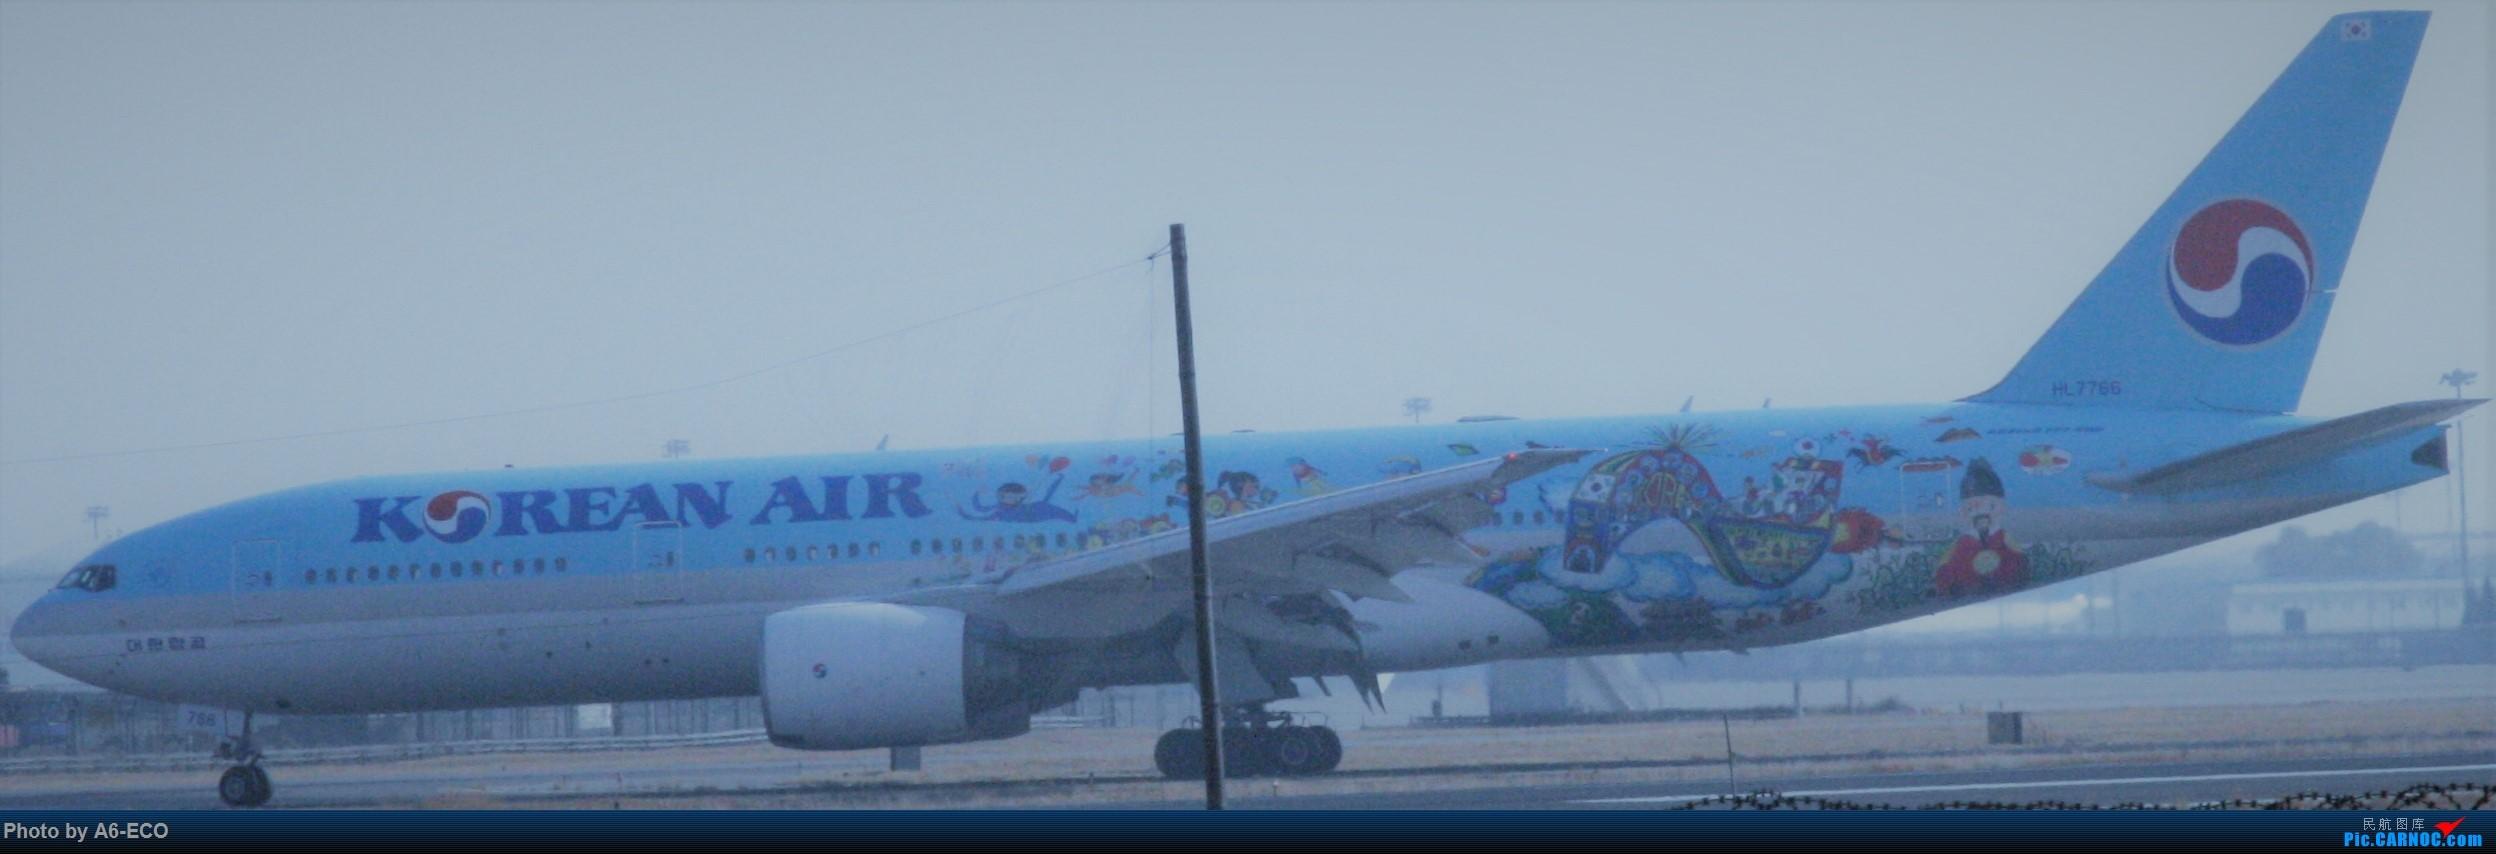 Re:[原创]今天运气极好,云南孔雀,B-1070,2个菜航邮戳,泡菜航彩绘,东航邮戳...... BOEING 777-200ER HL7766 中国北京首都国际机场